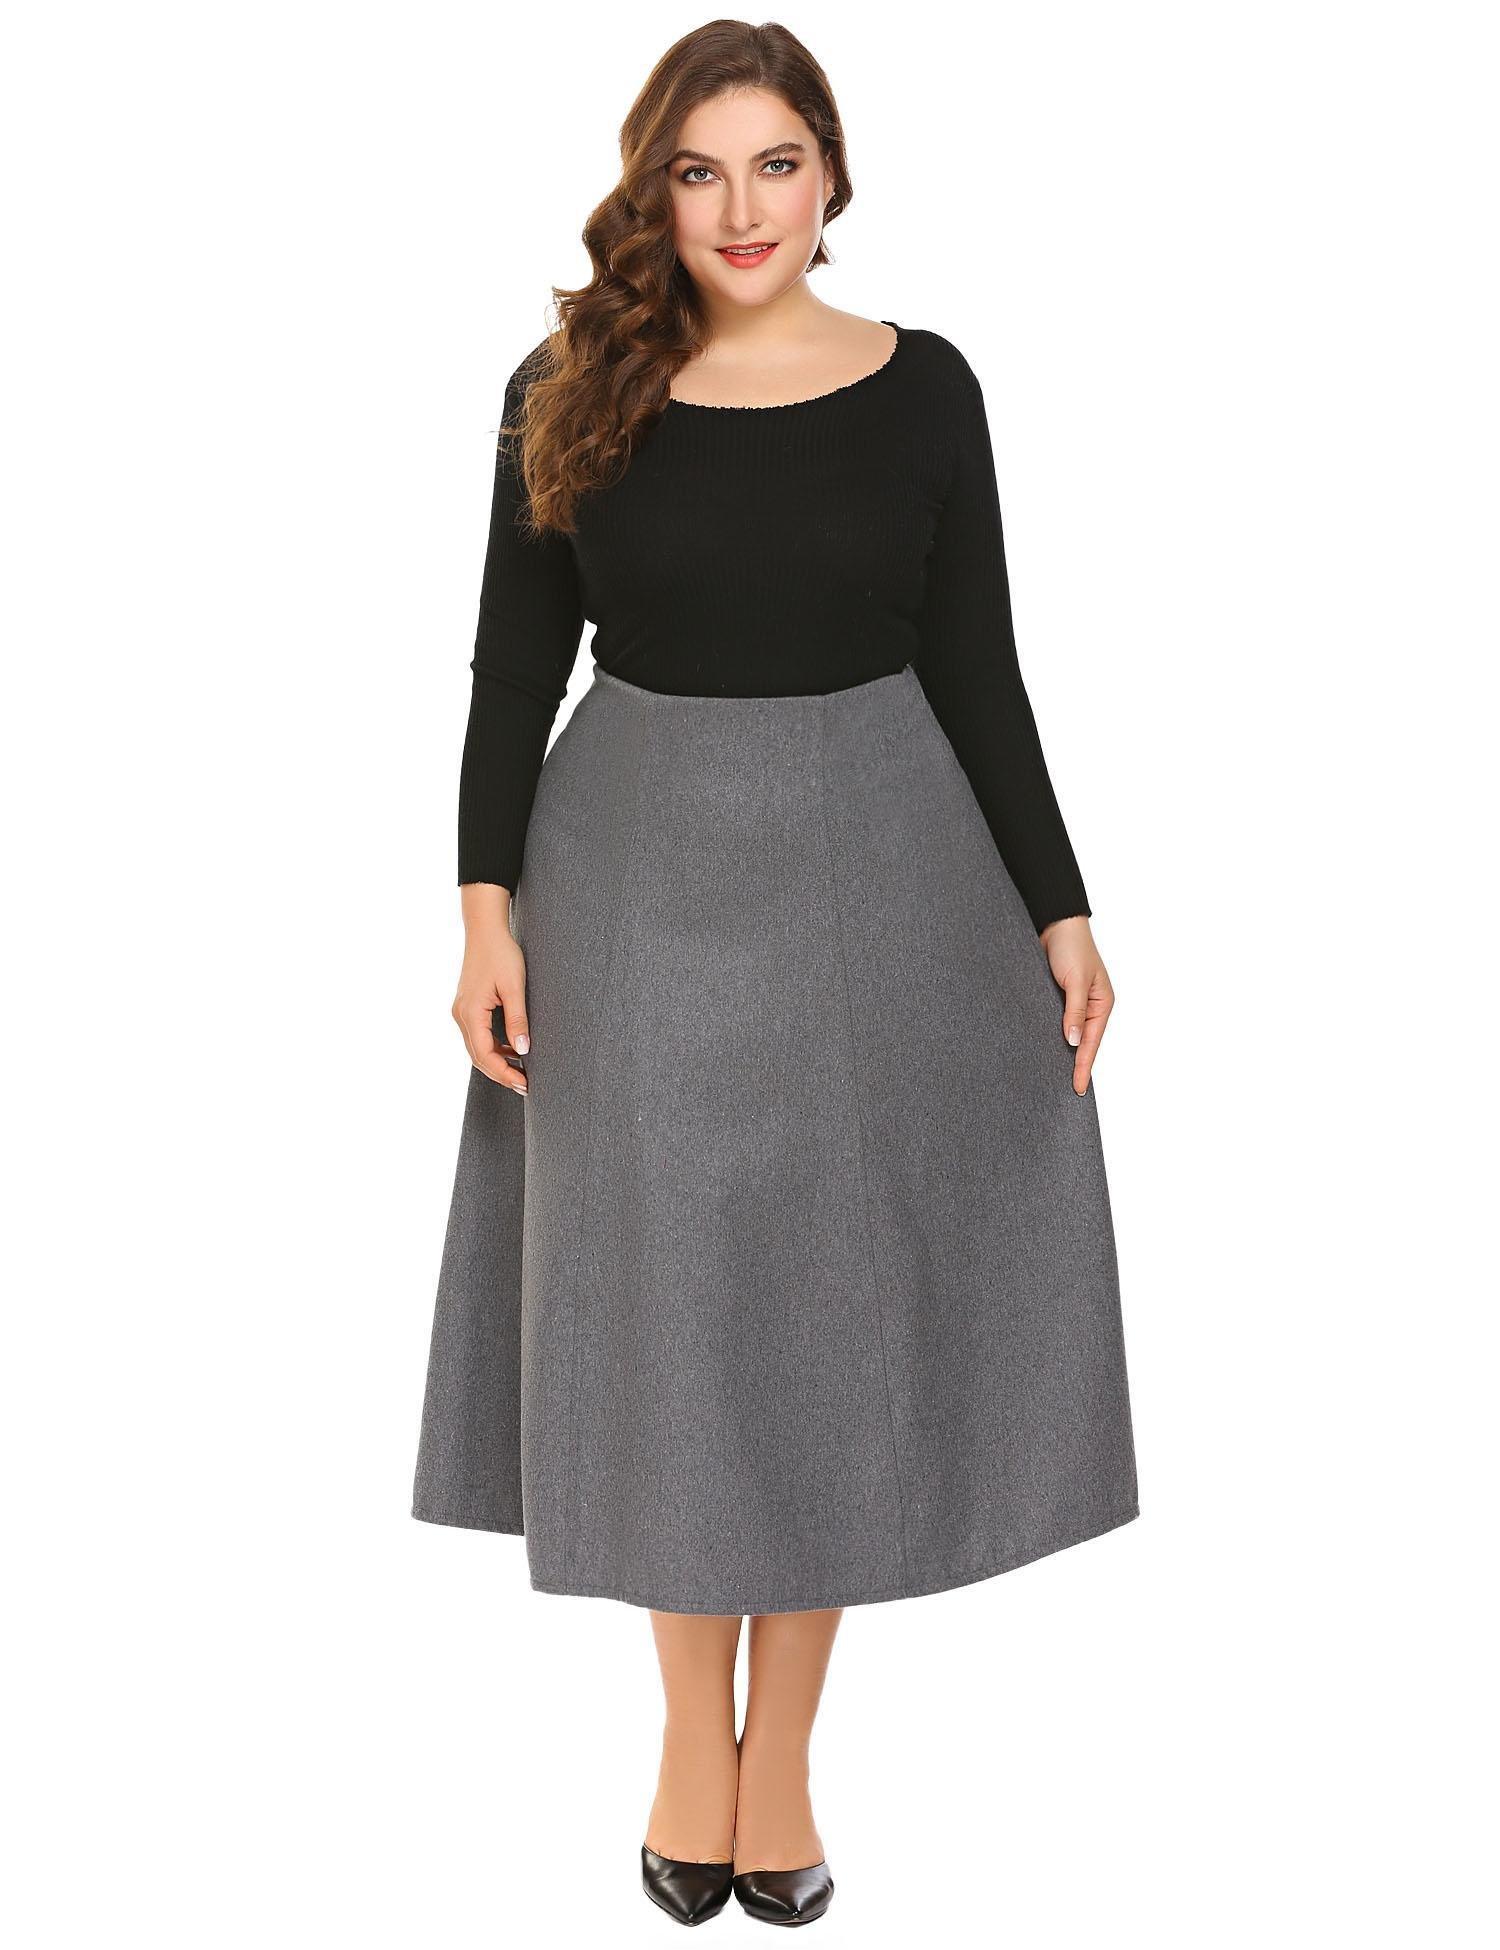 Adidome Women's High Waist Flared A-line Pleated Midi Long Skirt with Pocket(Grey,2XL)